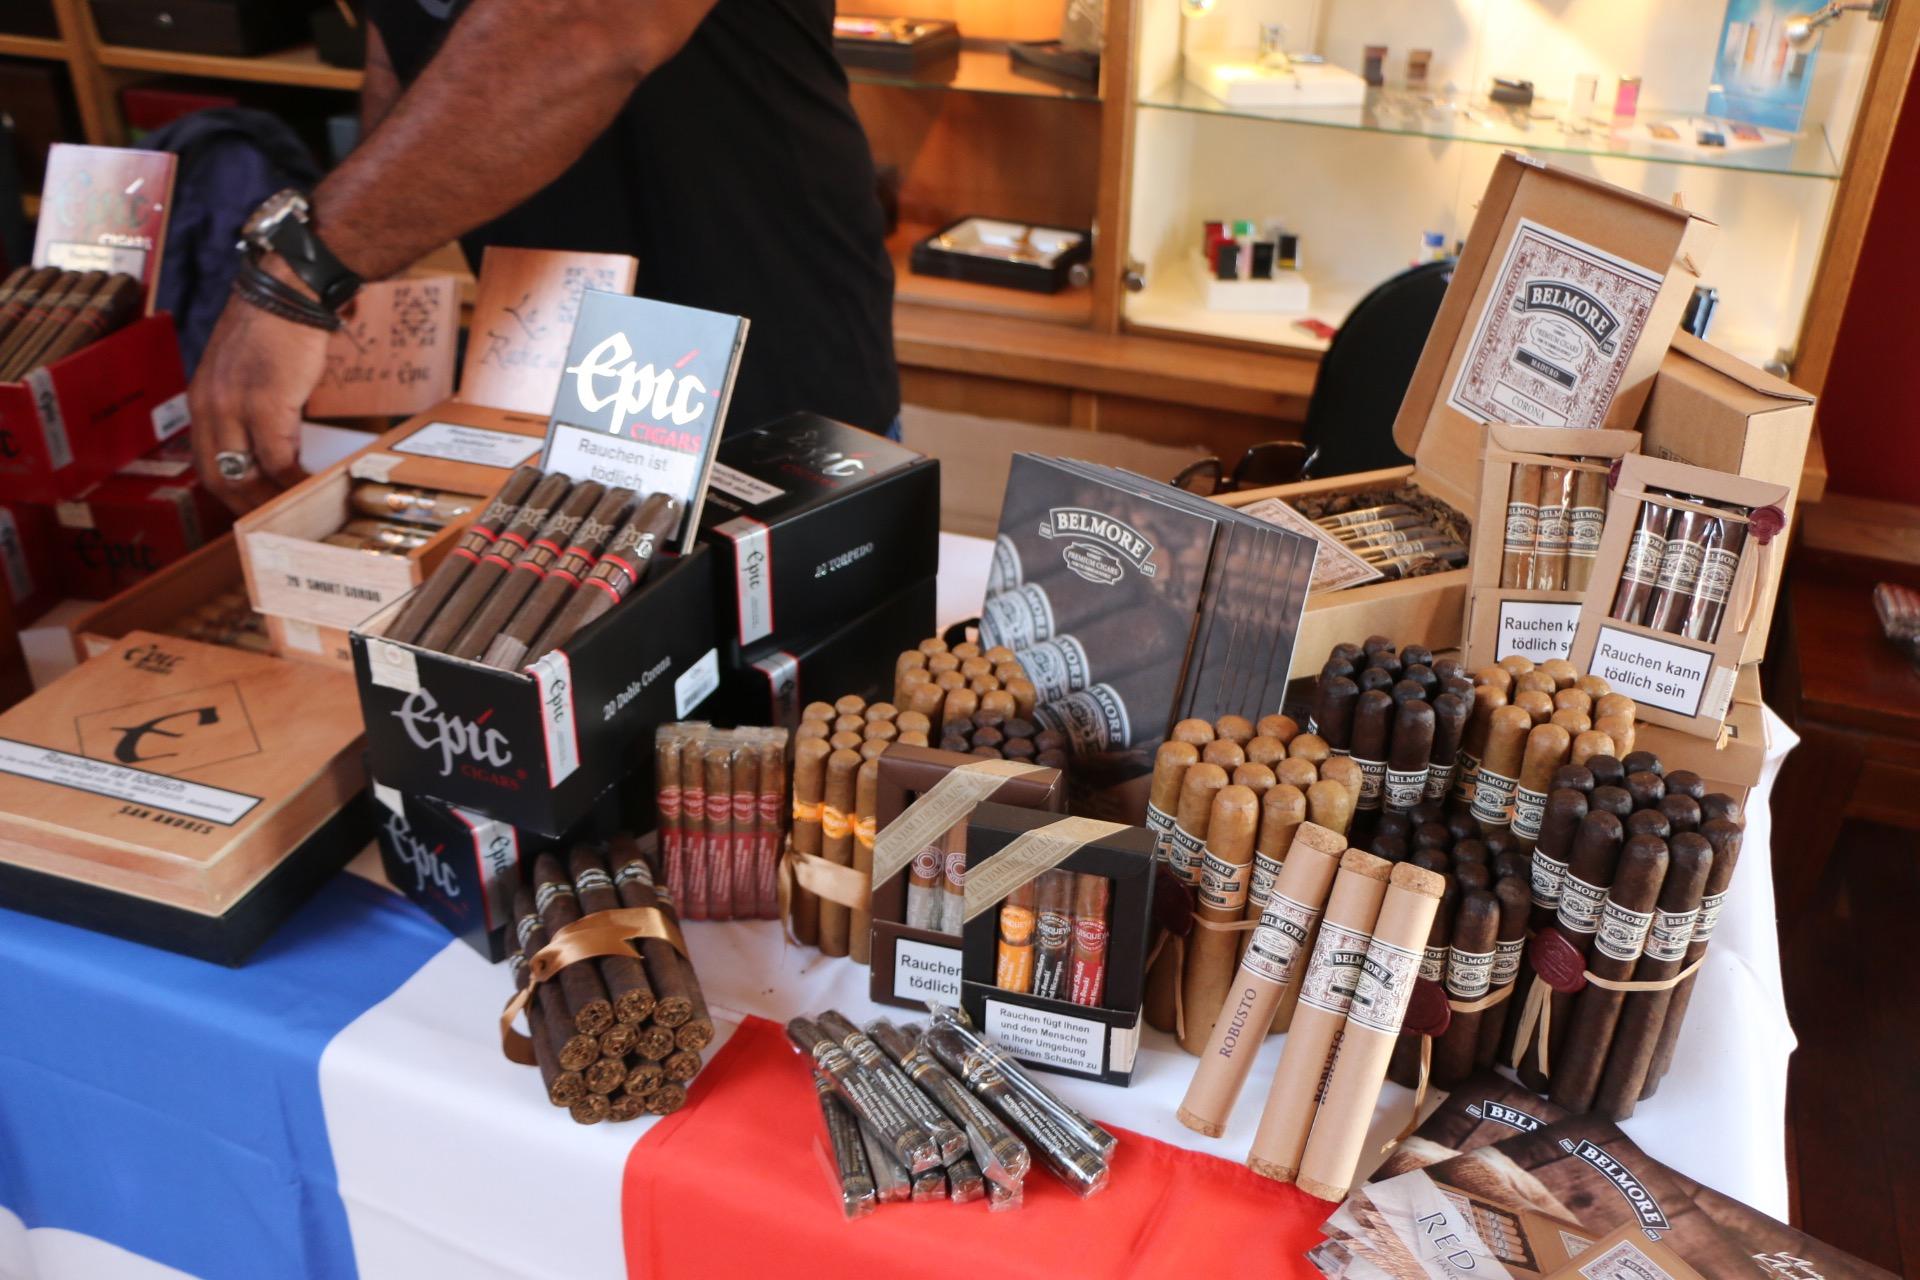 Epic Cigars & Belmore Cigars